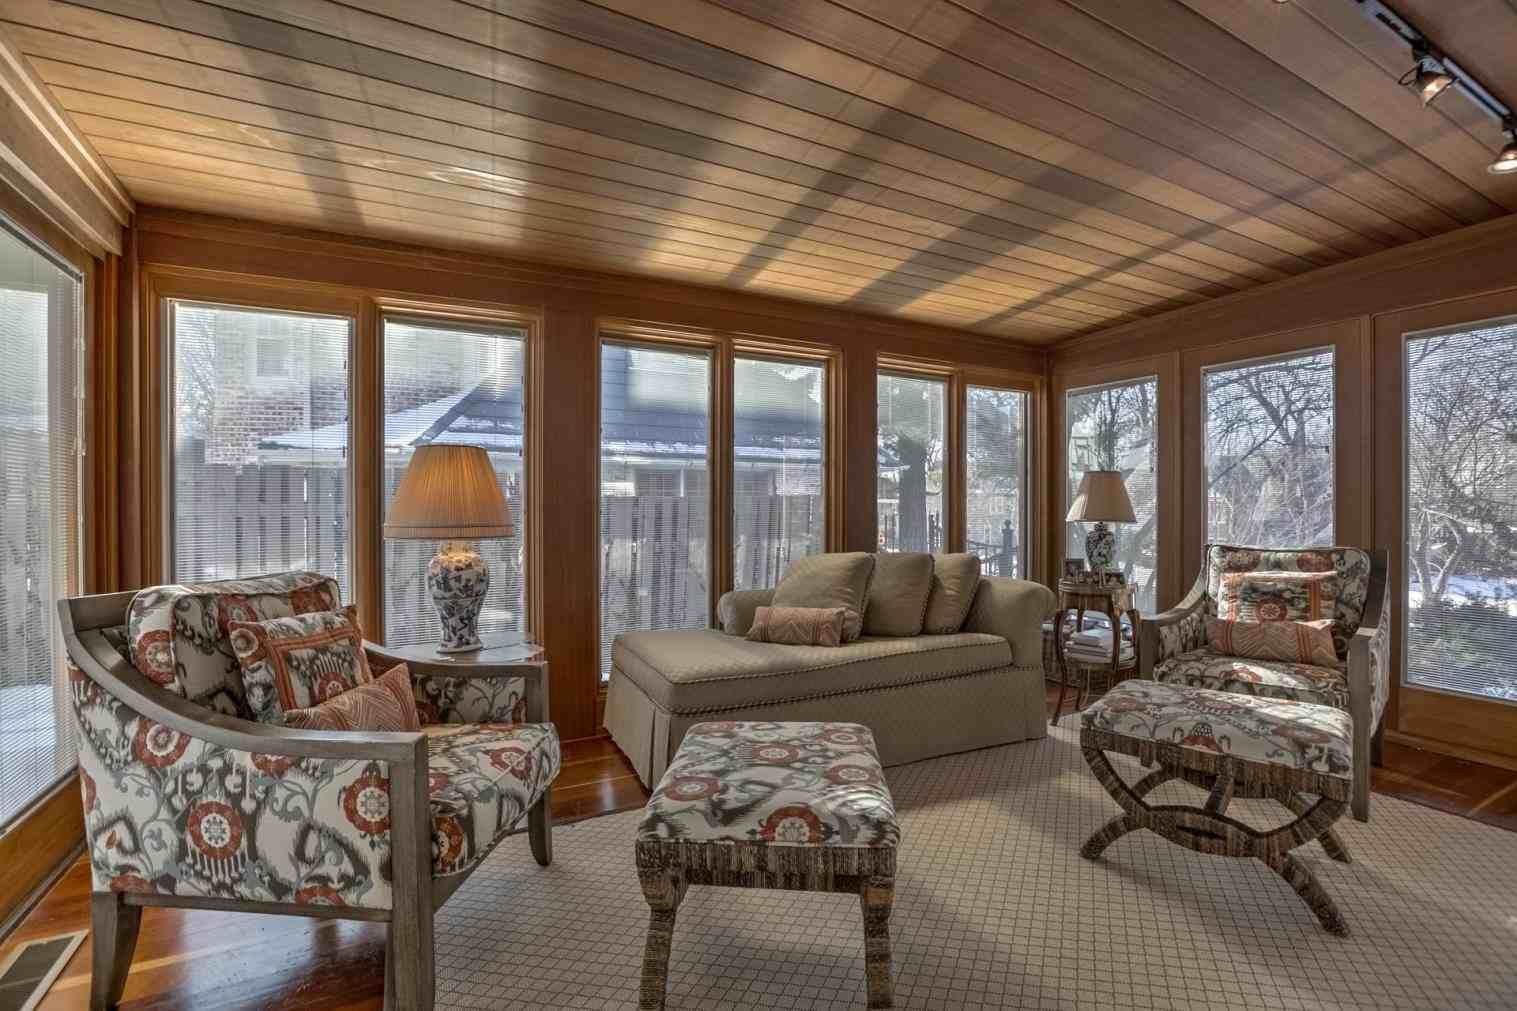 This 3 Bedroom Apartments For Rent In Omaha Ne Kensington Woods Apartments Omaha Nebraska Rentpingcom Camelot